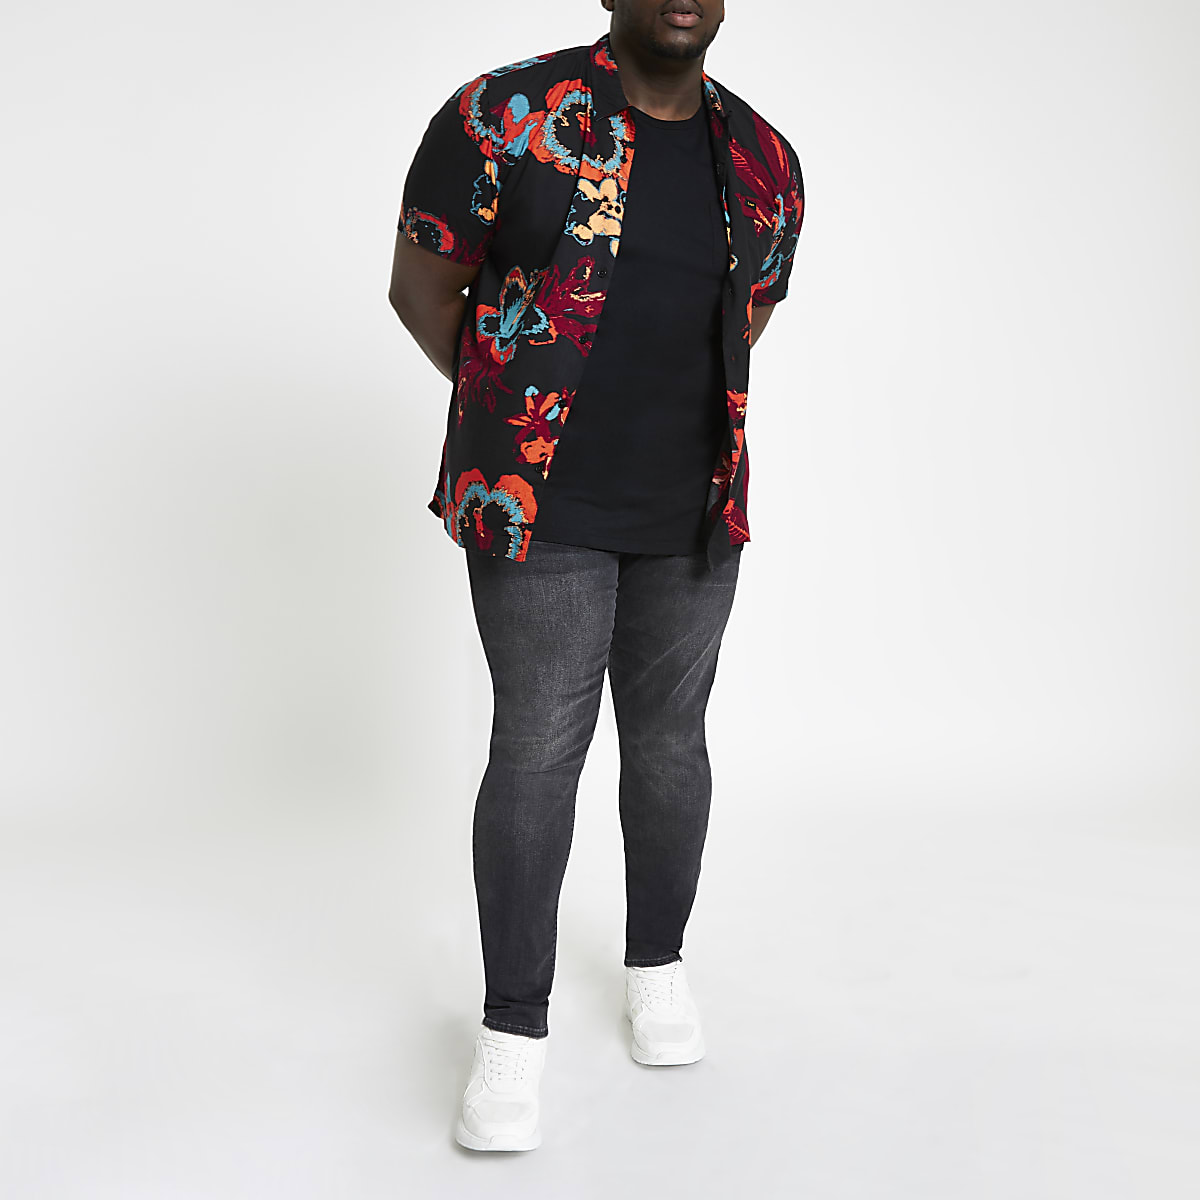 Lee – Big & Tall – Weißes, geblümtes Hemd